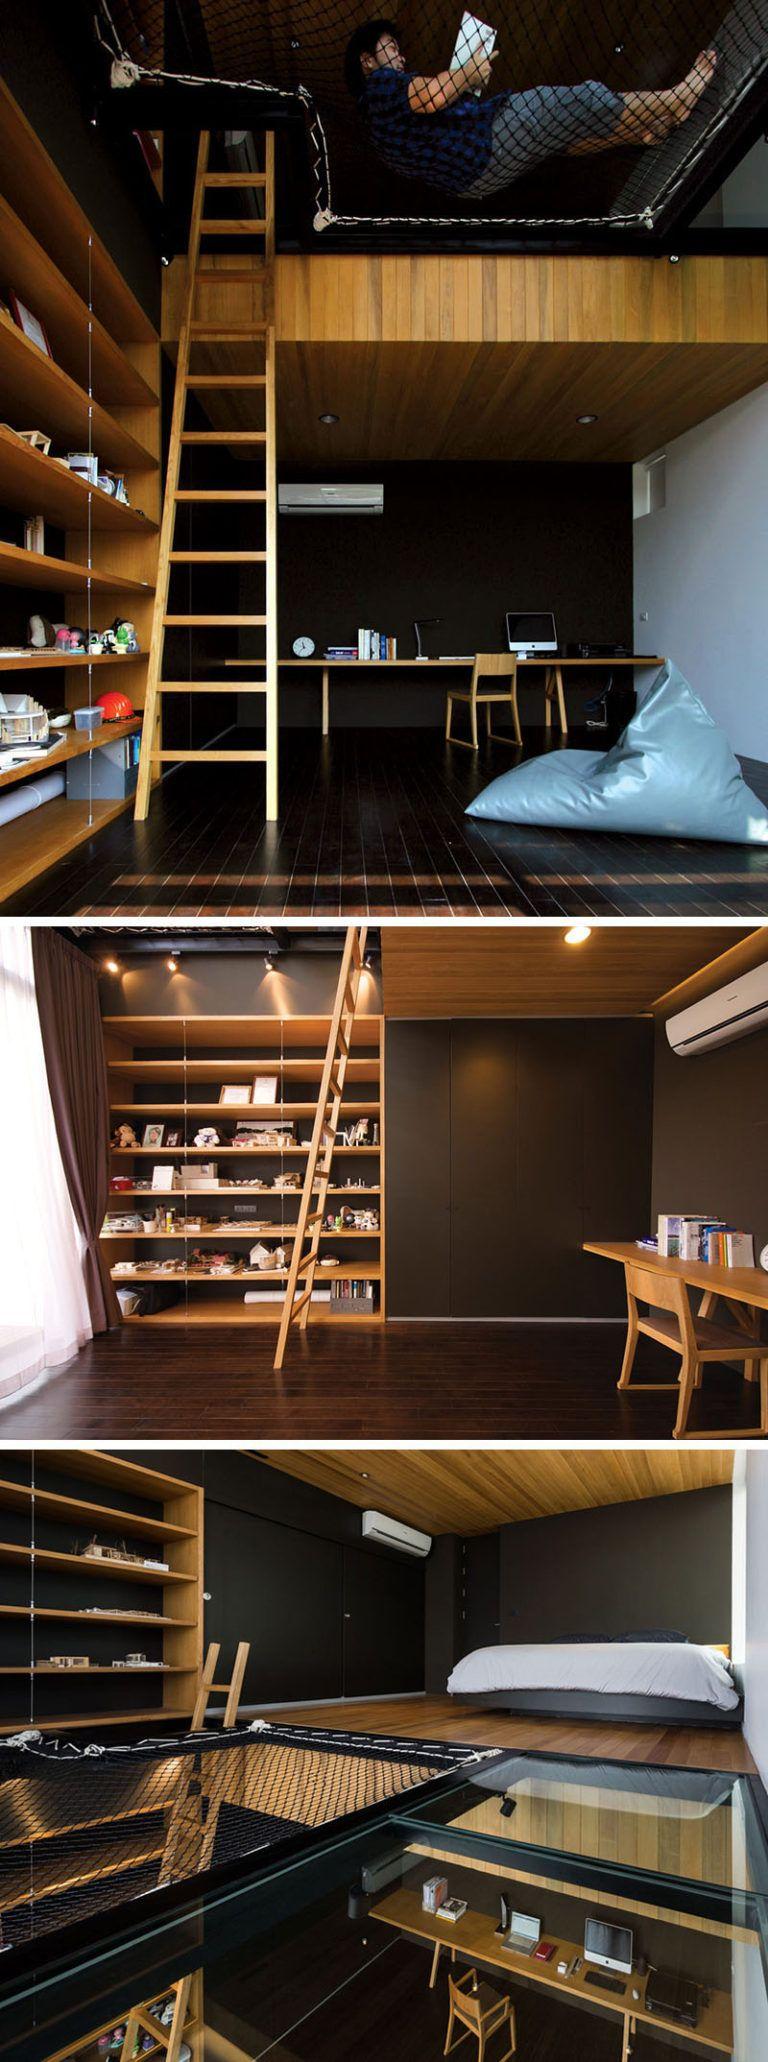 Small Bedroom Room Ideas